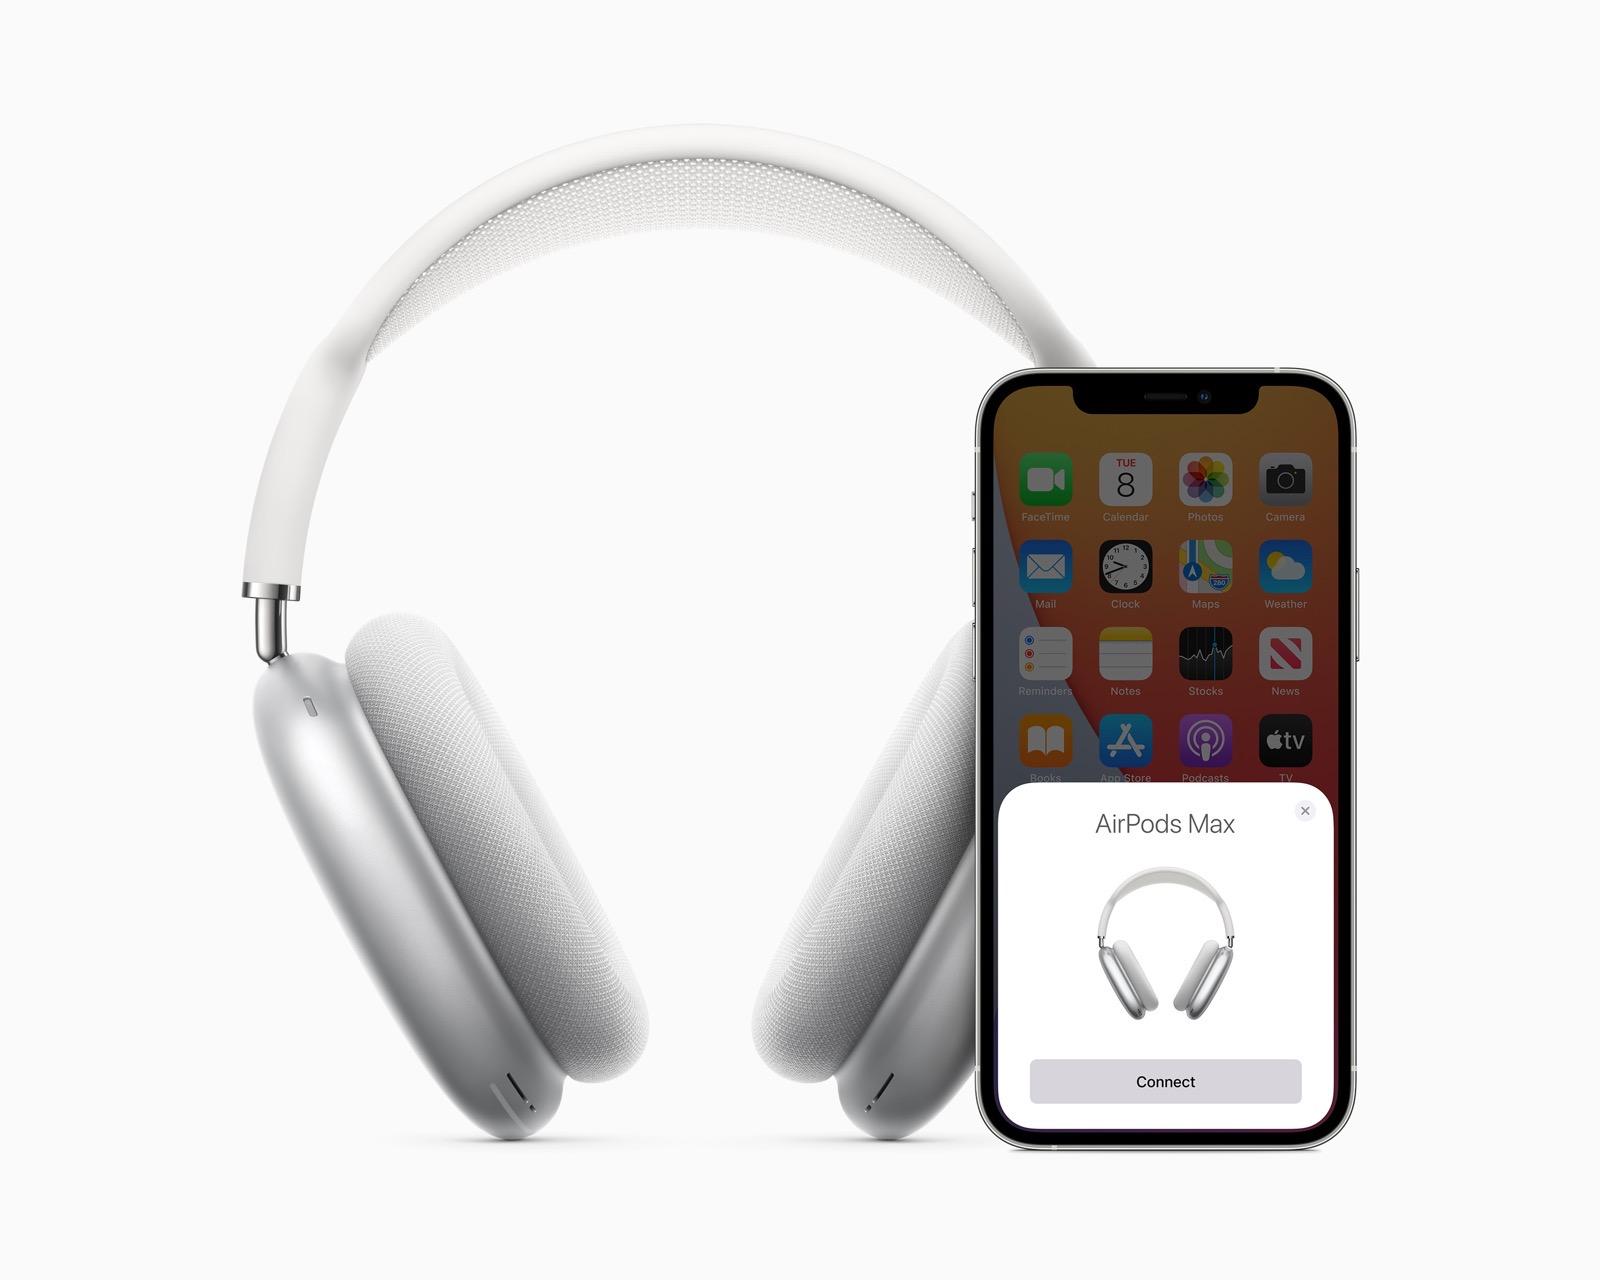 Apple airpods max pairing 12082020